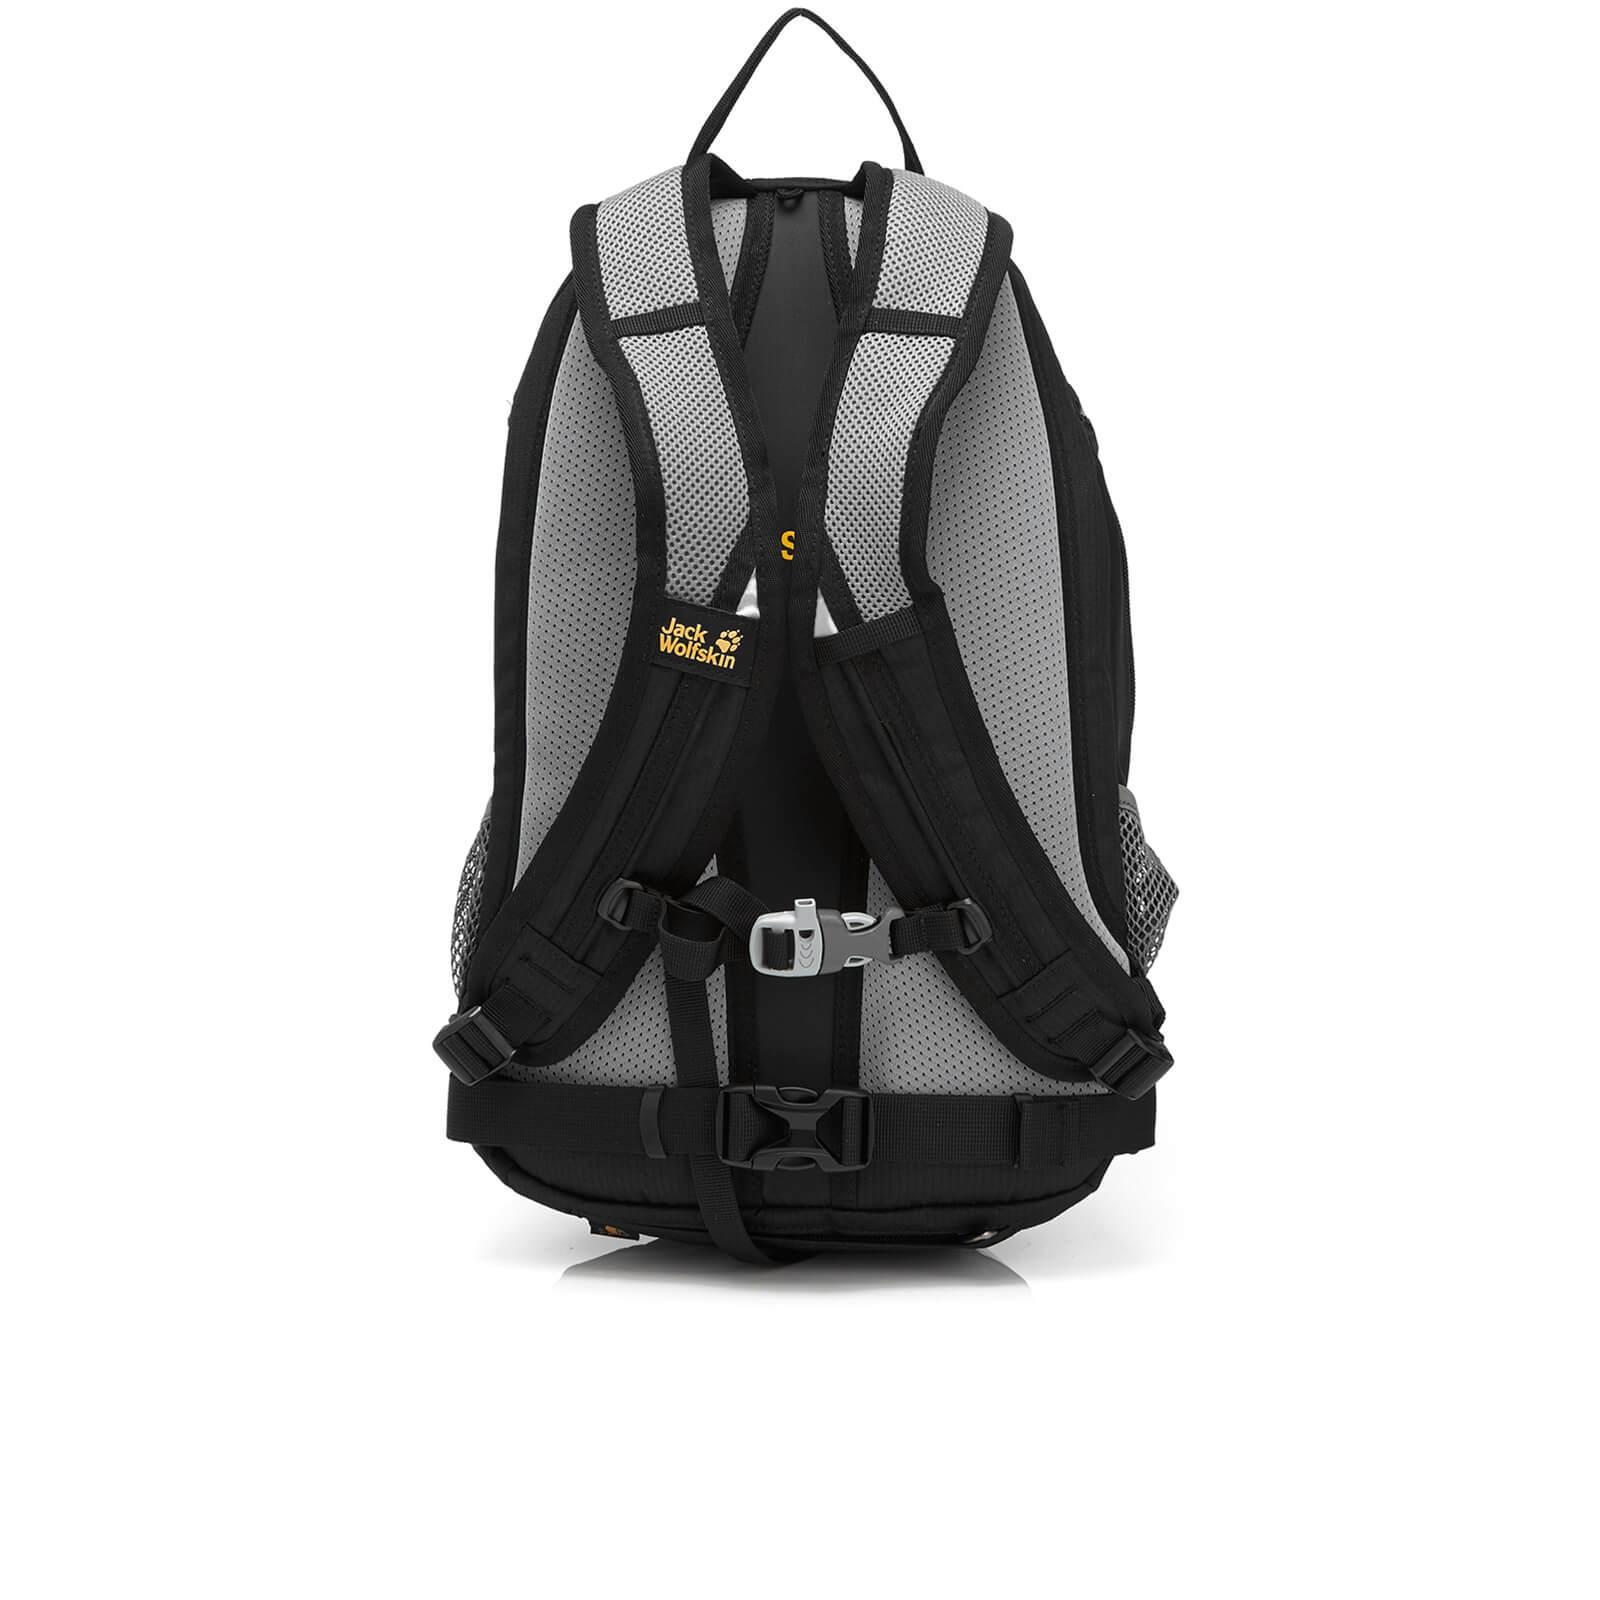 Velocity 12 Bike Backpack From Eastern Mountain Sports